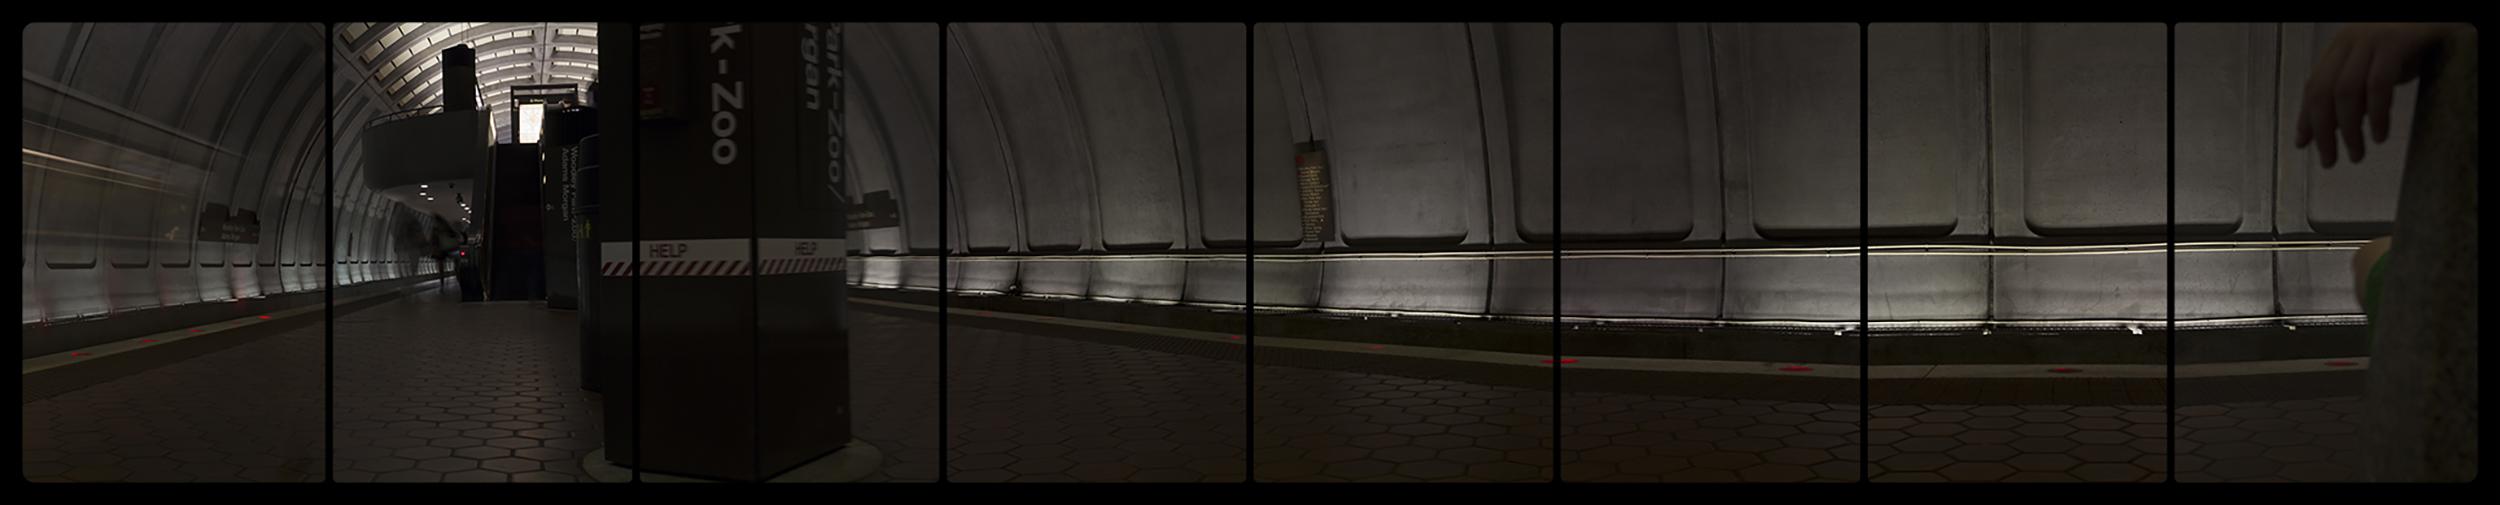 Metro, Rail Woodley Park-Zoo,6-15-2014,2756-2763